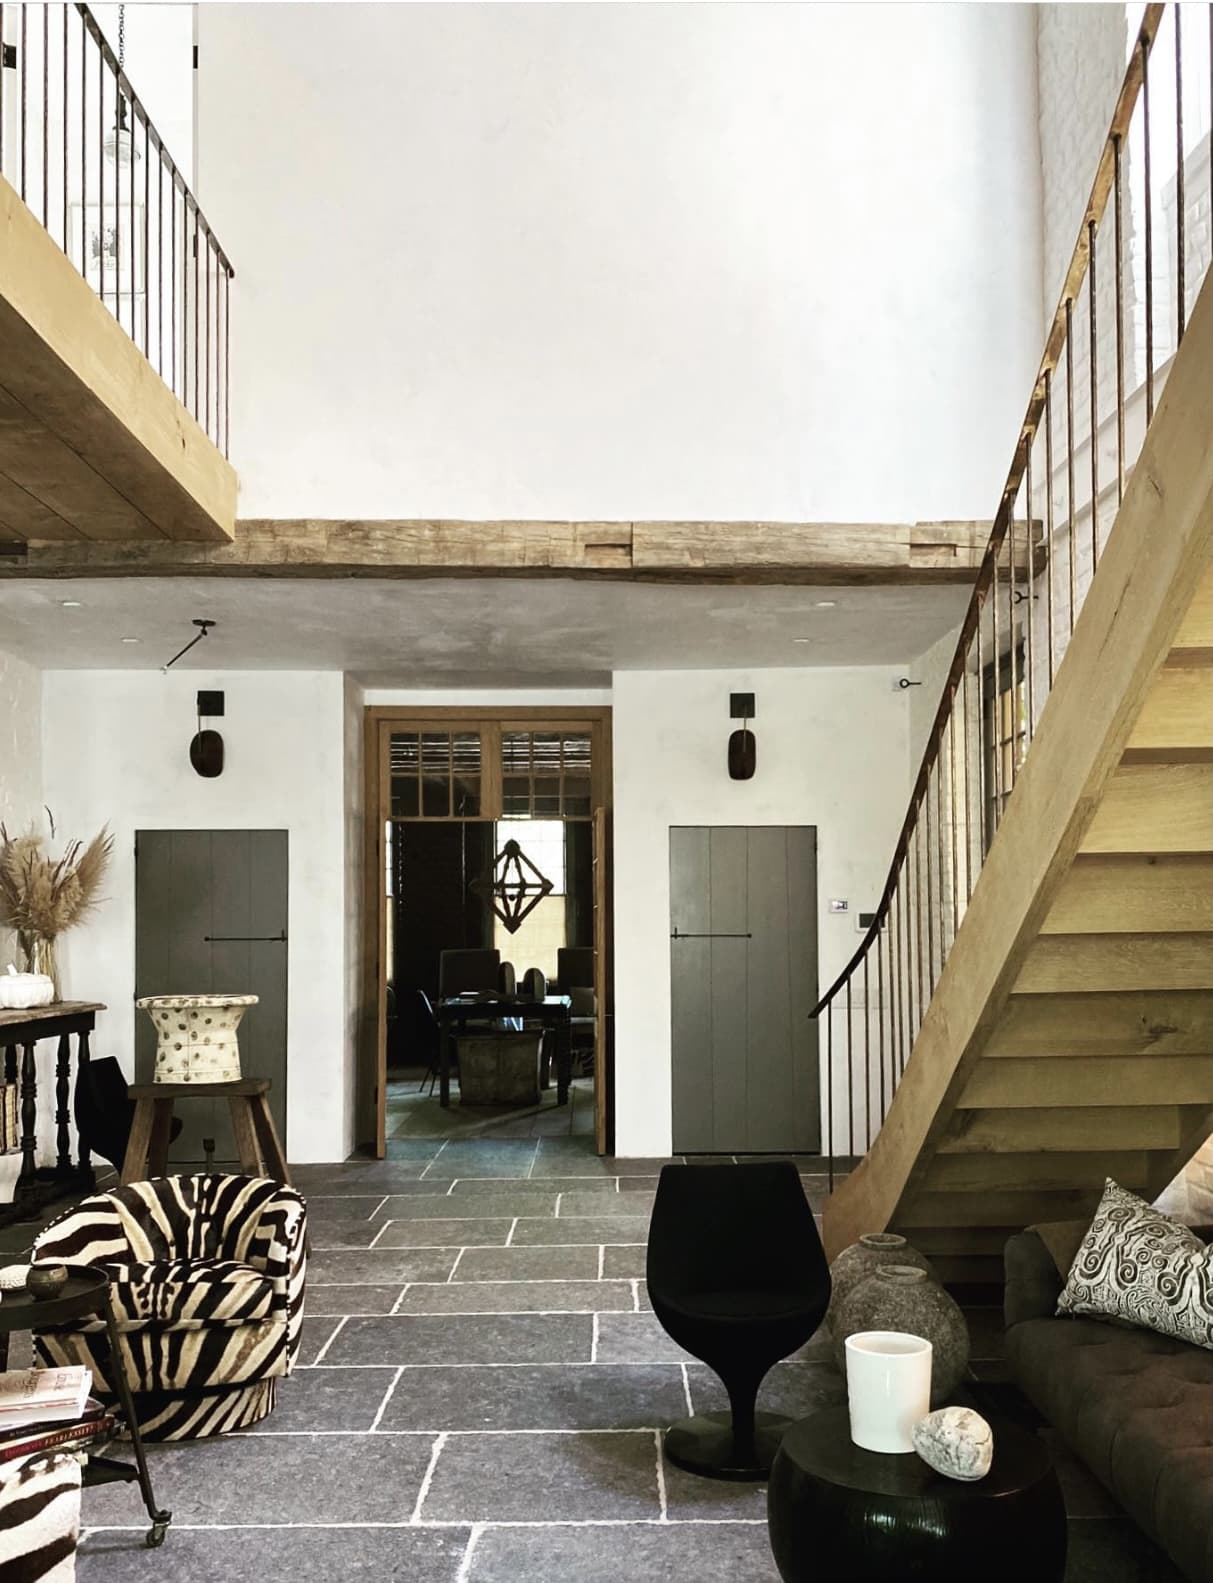 Jill Sharp Weeks Charleston Home on Instagram via Cindy Hattersley's blog